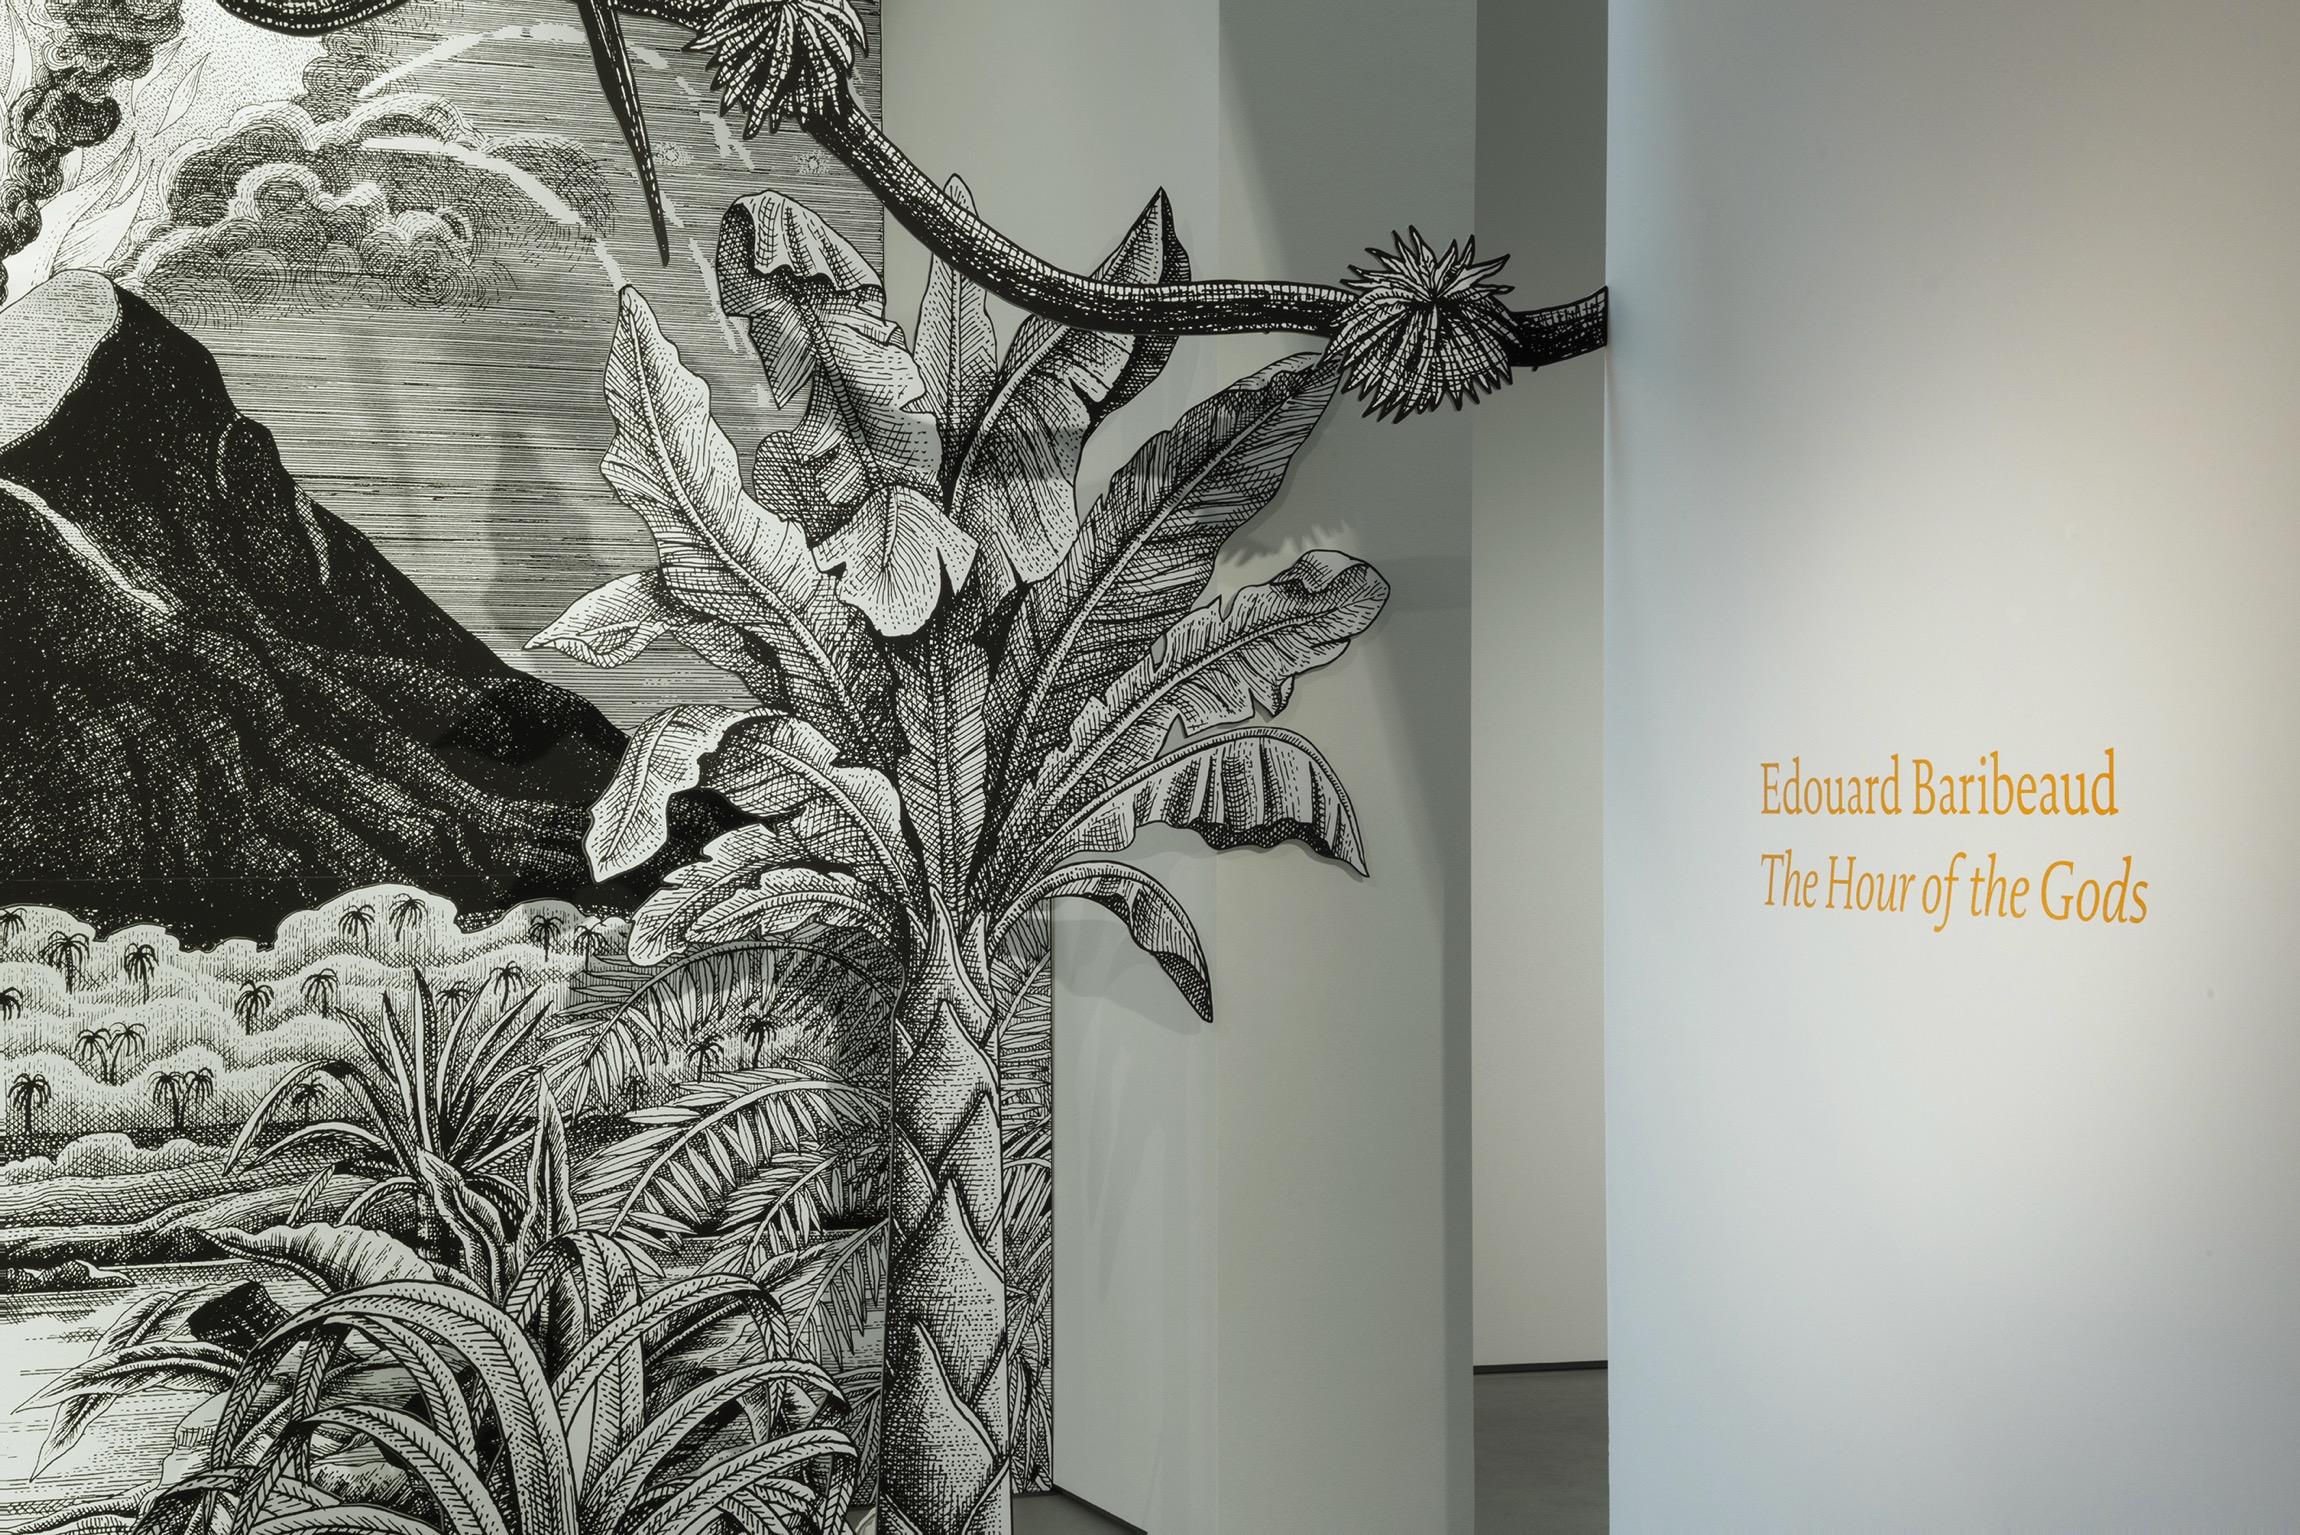 2015 Edouard Baribeaud The Hour of the Gods